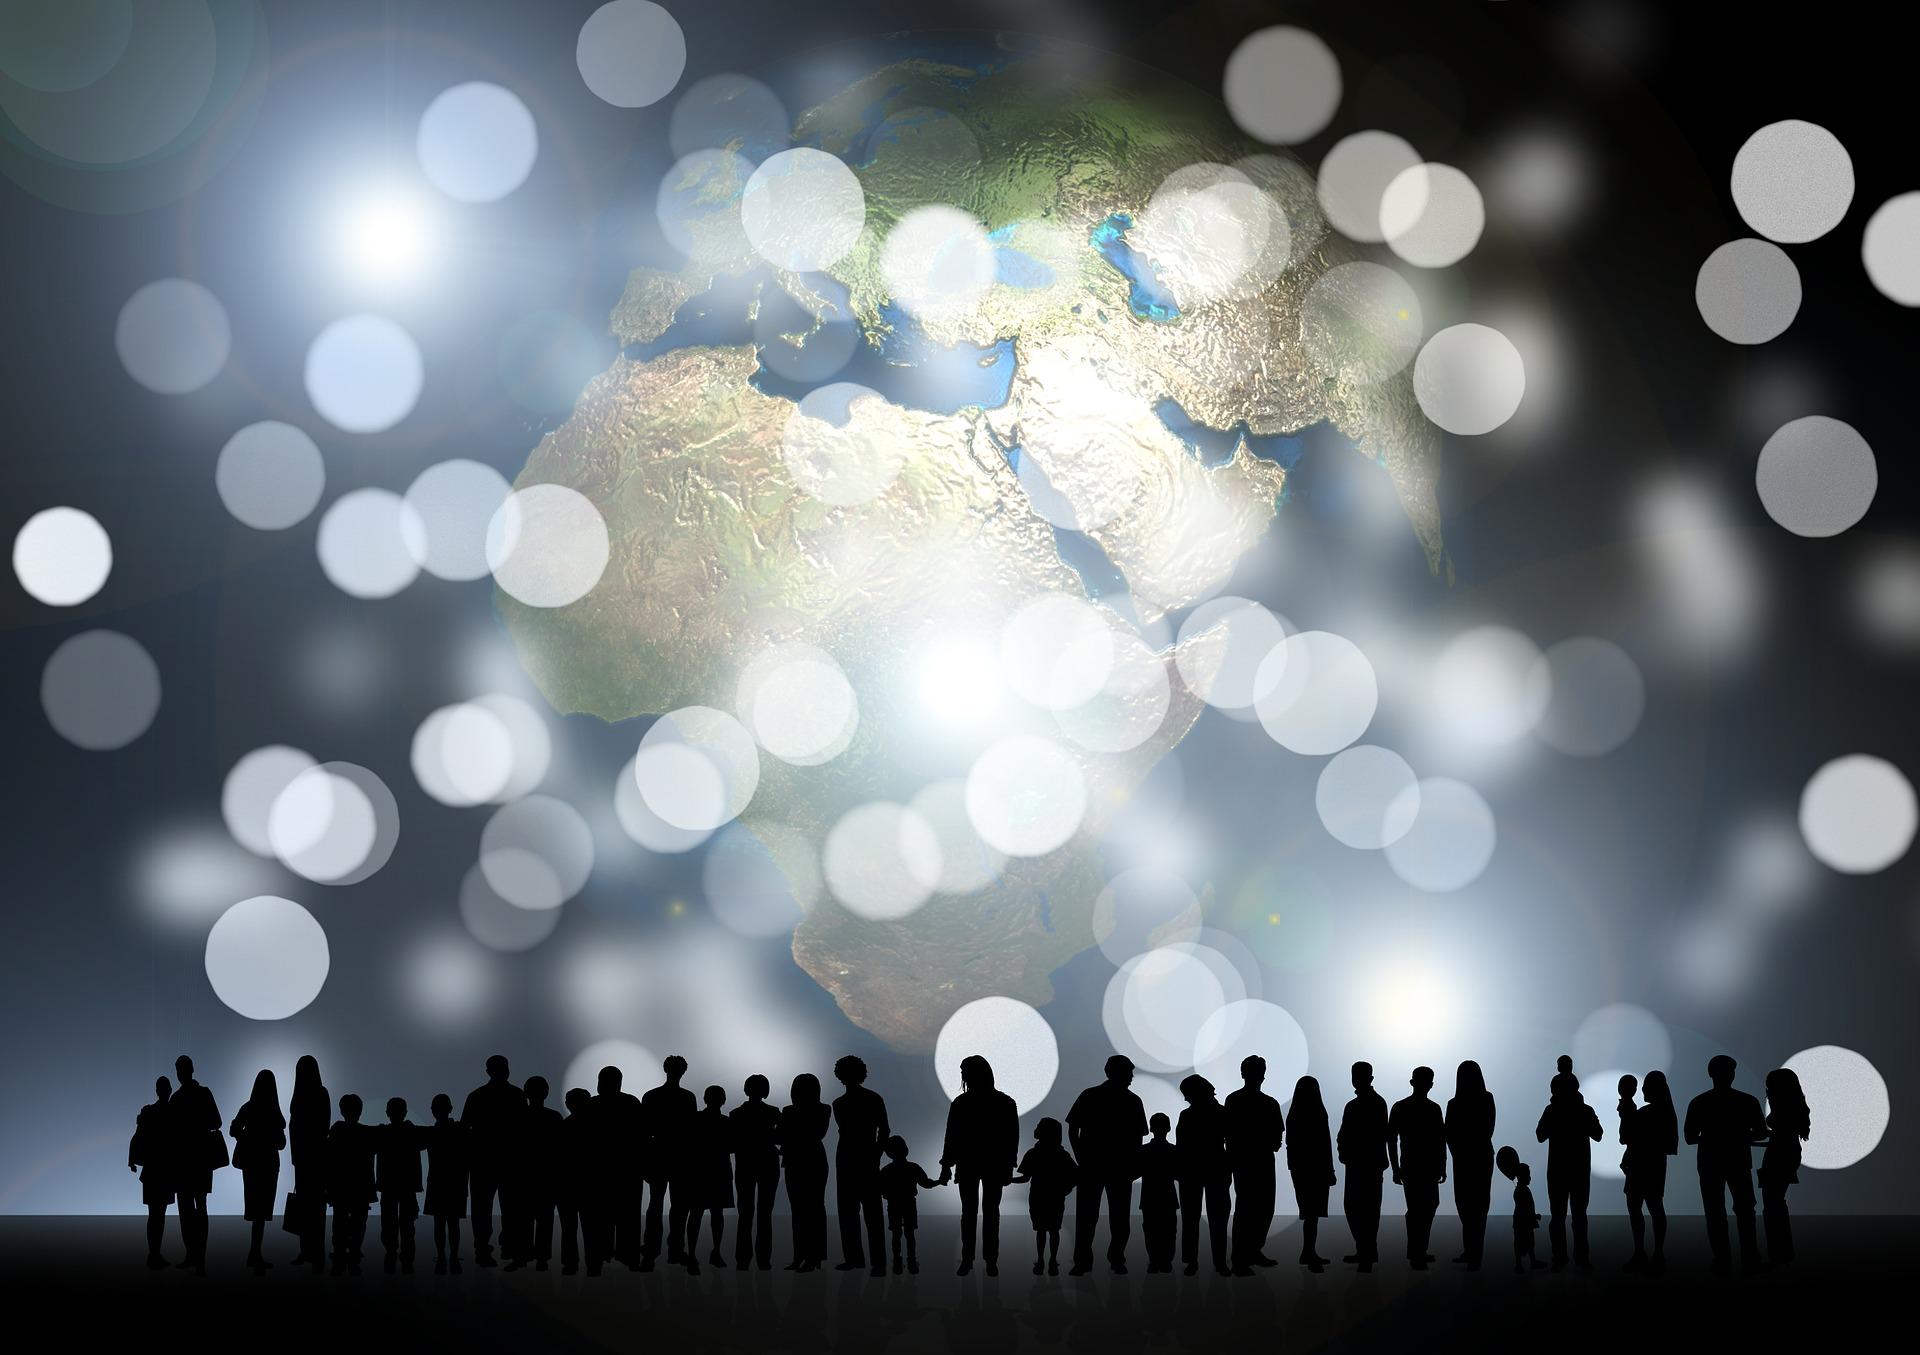 People in light